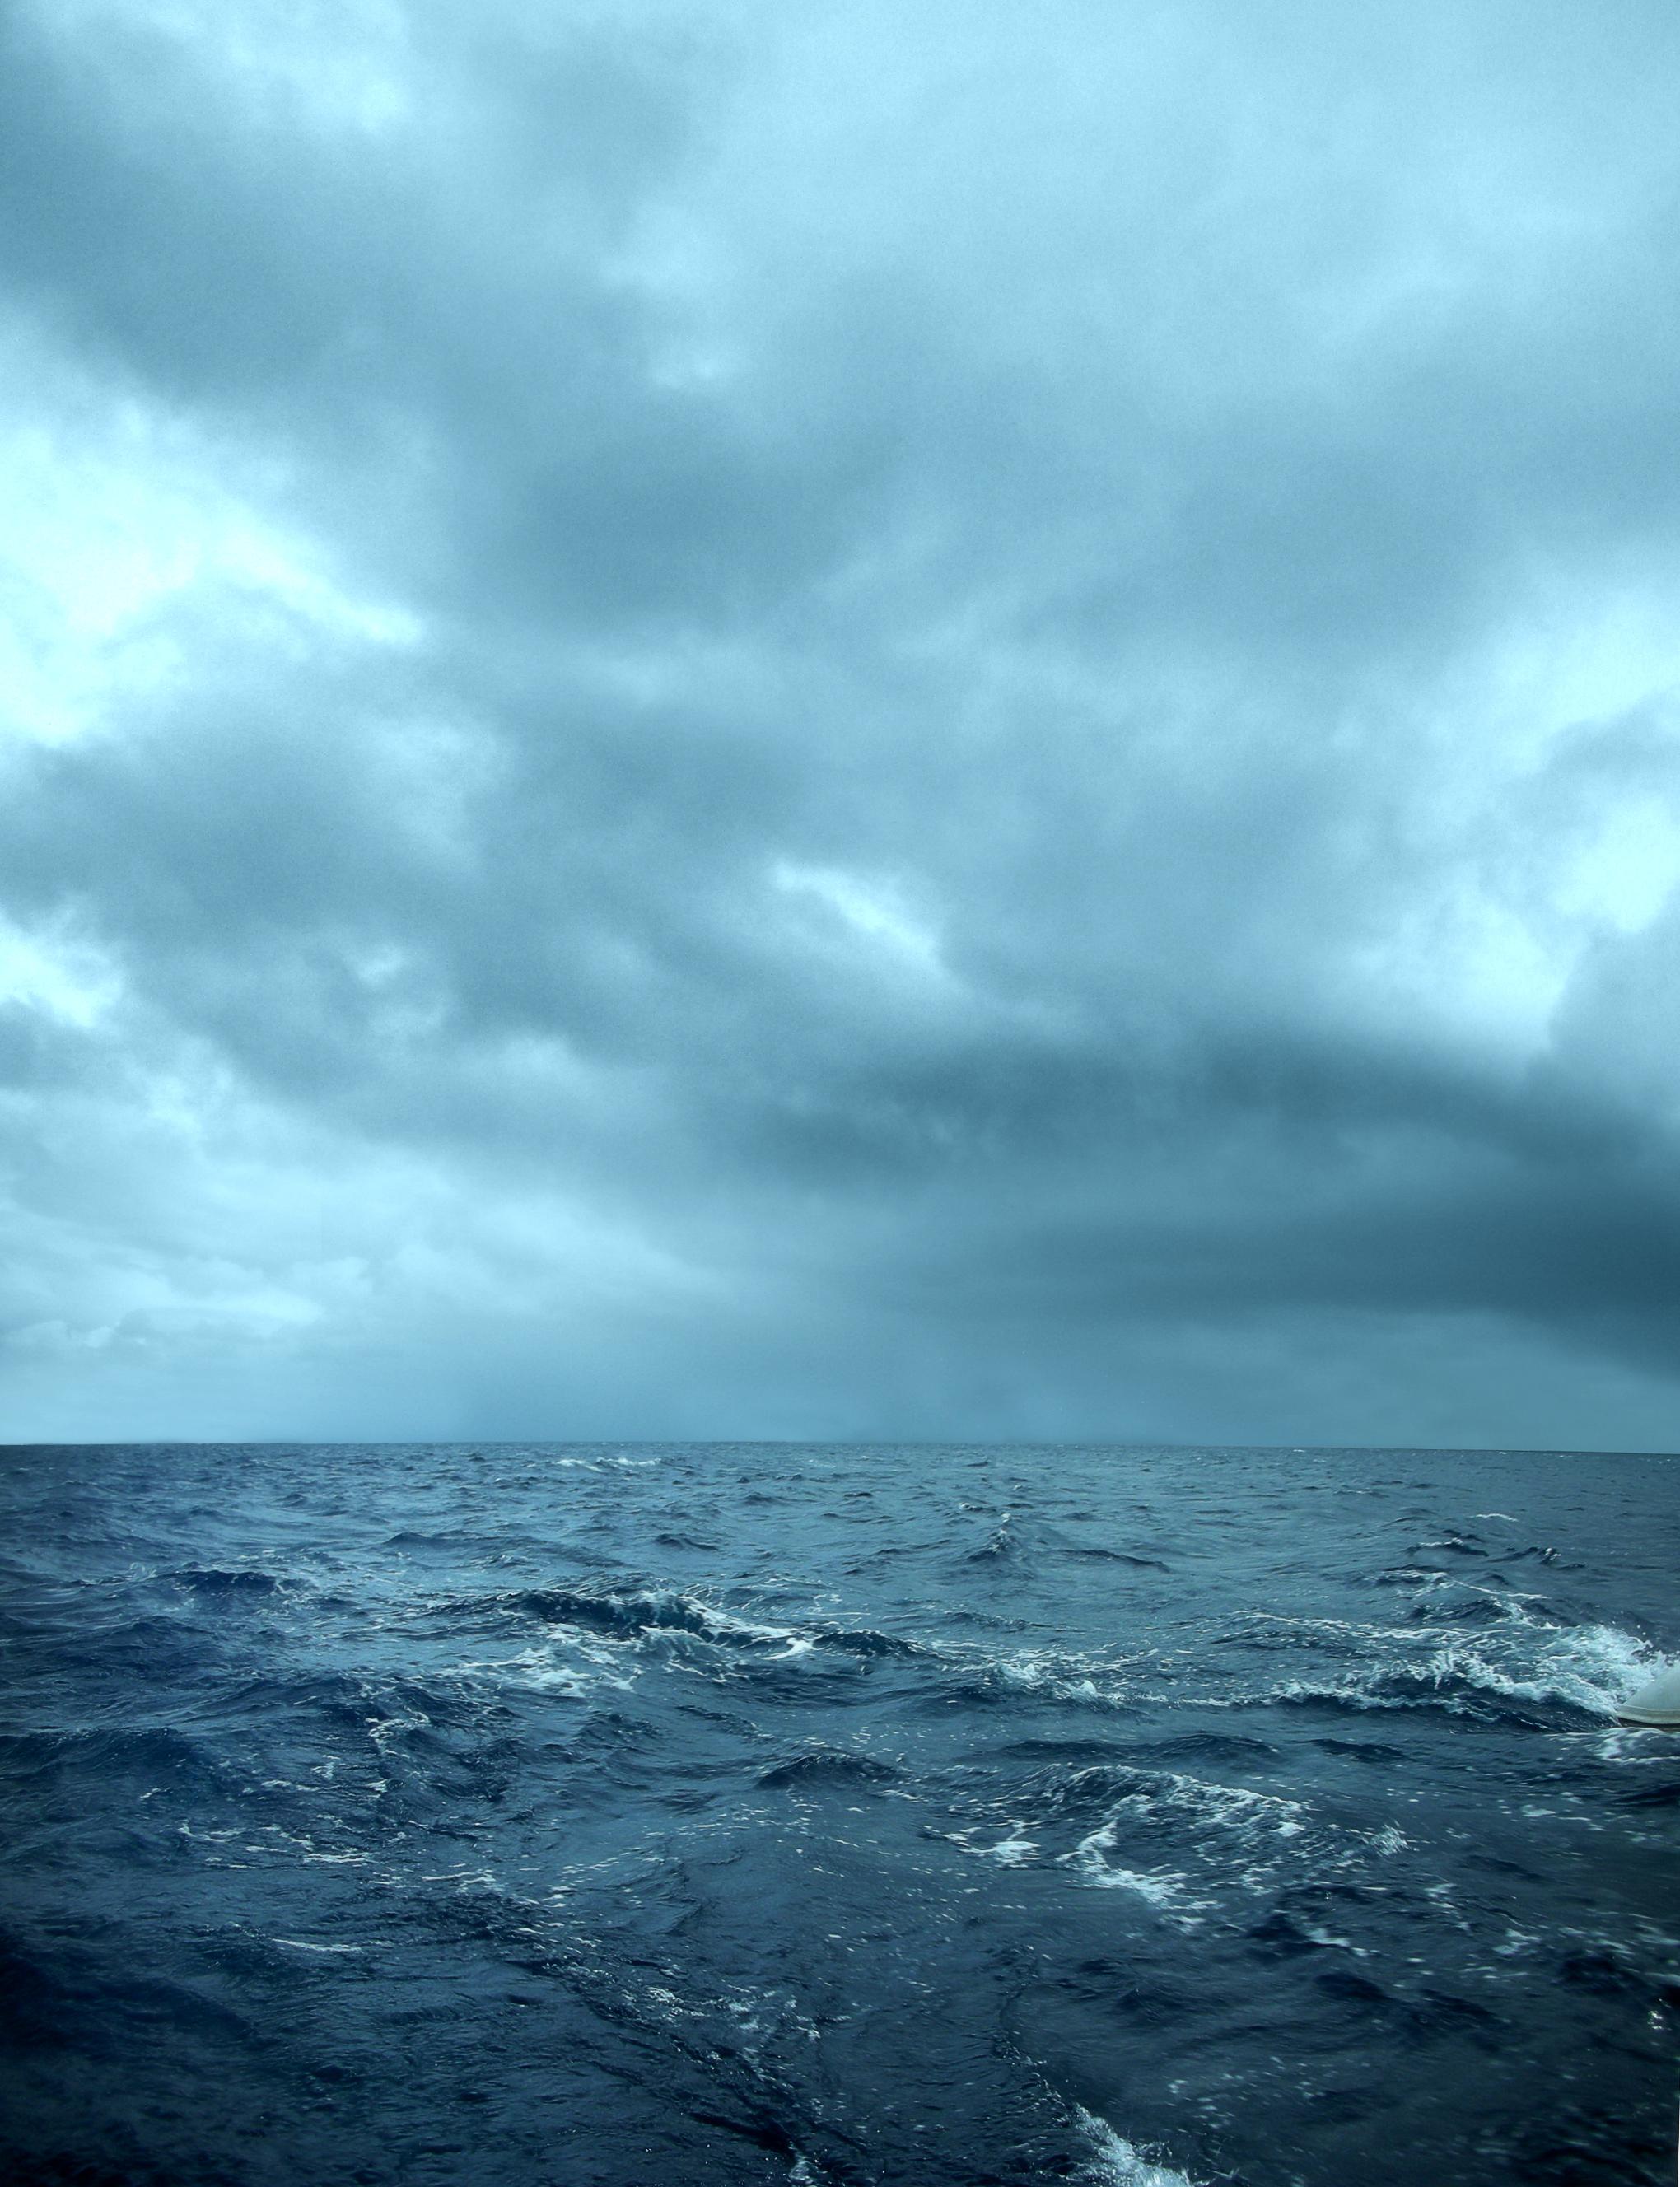 ���� ����� ����� Stormy_sea_by_darkrose42_stock.jpg